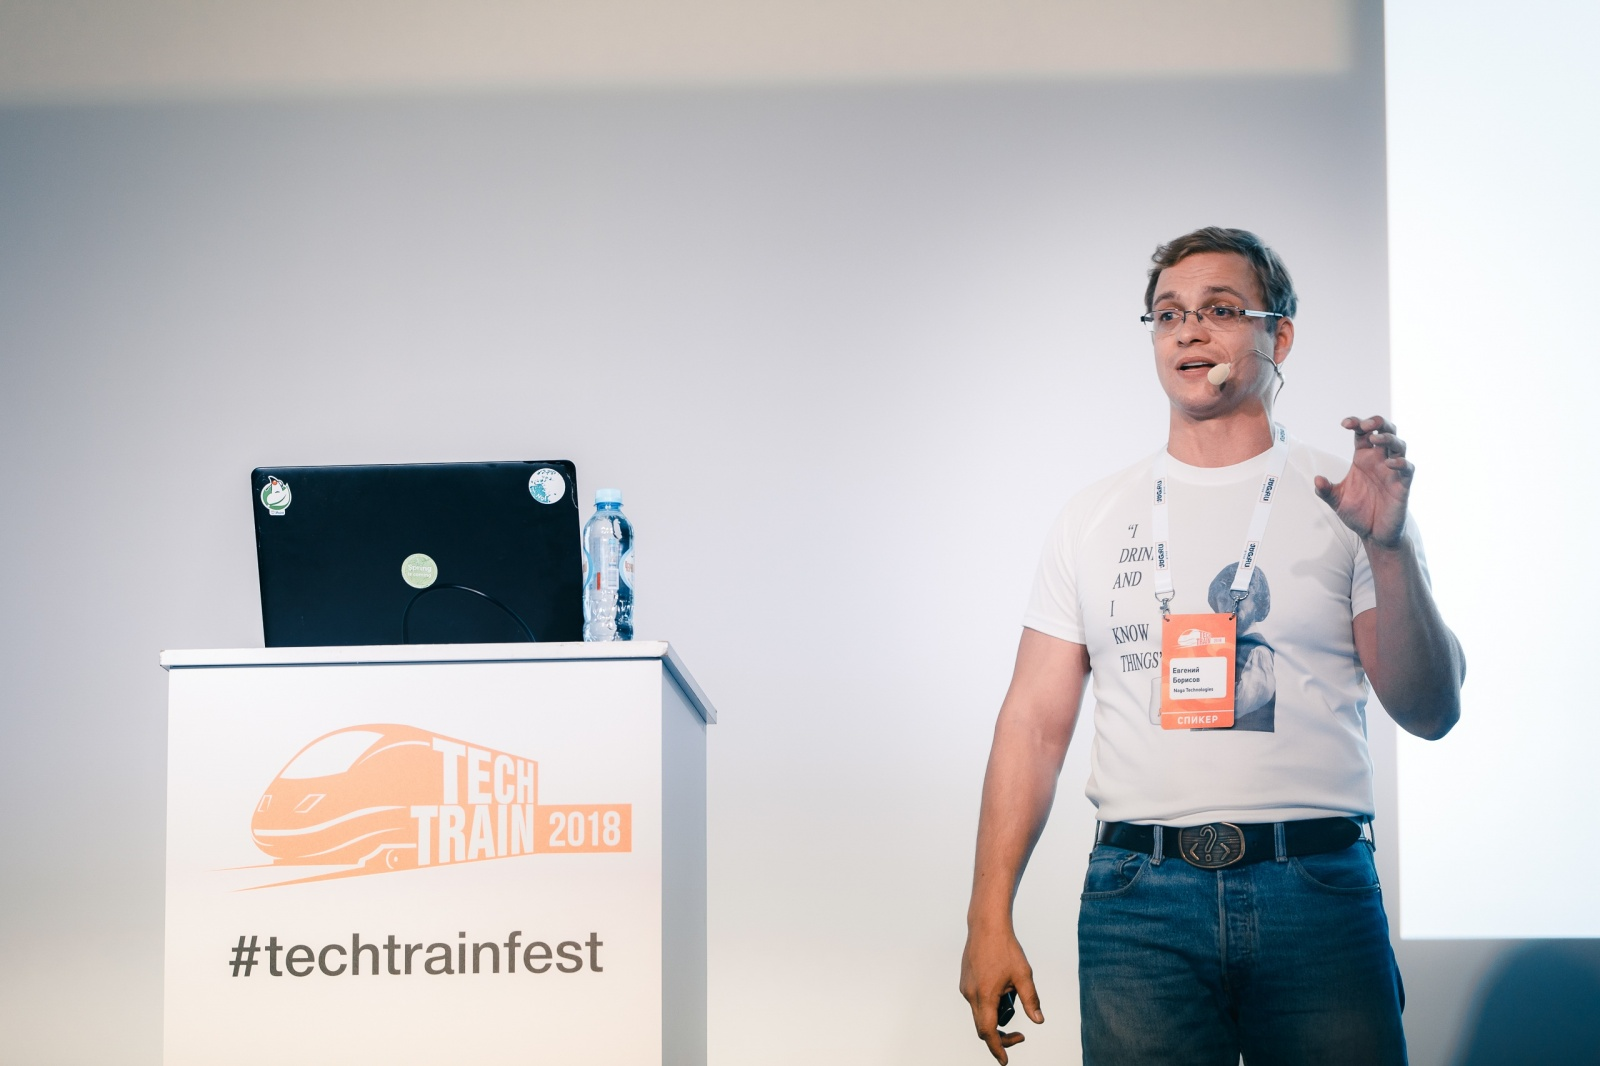 От Котлина до Гоблина: как прошёл TechTrain - 11